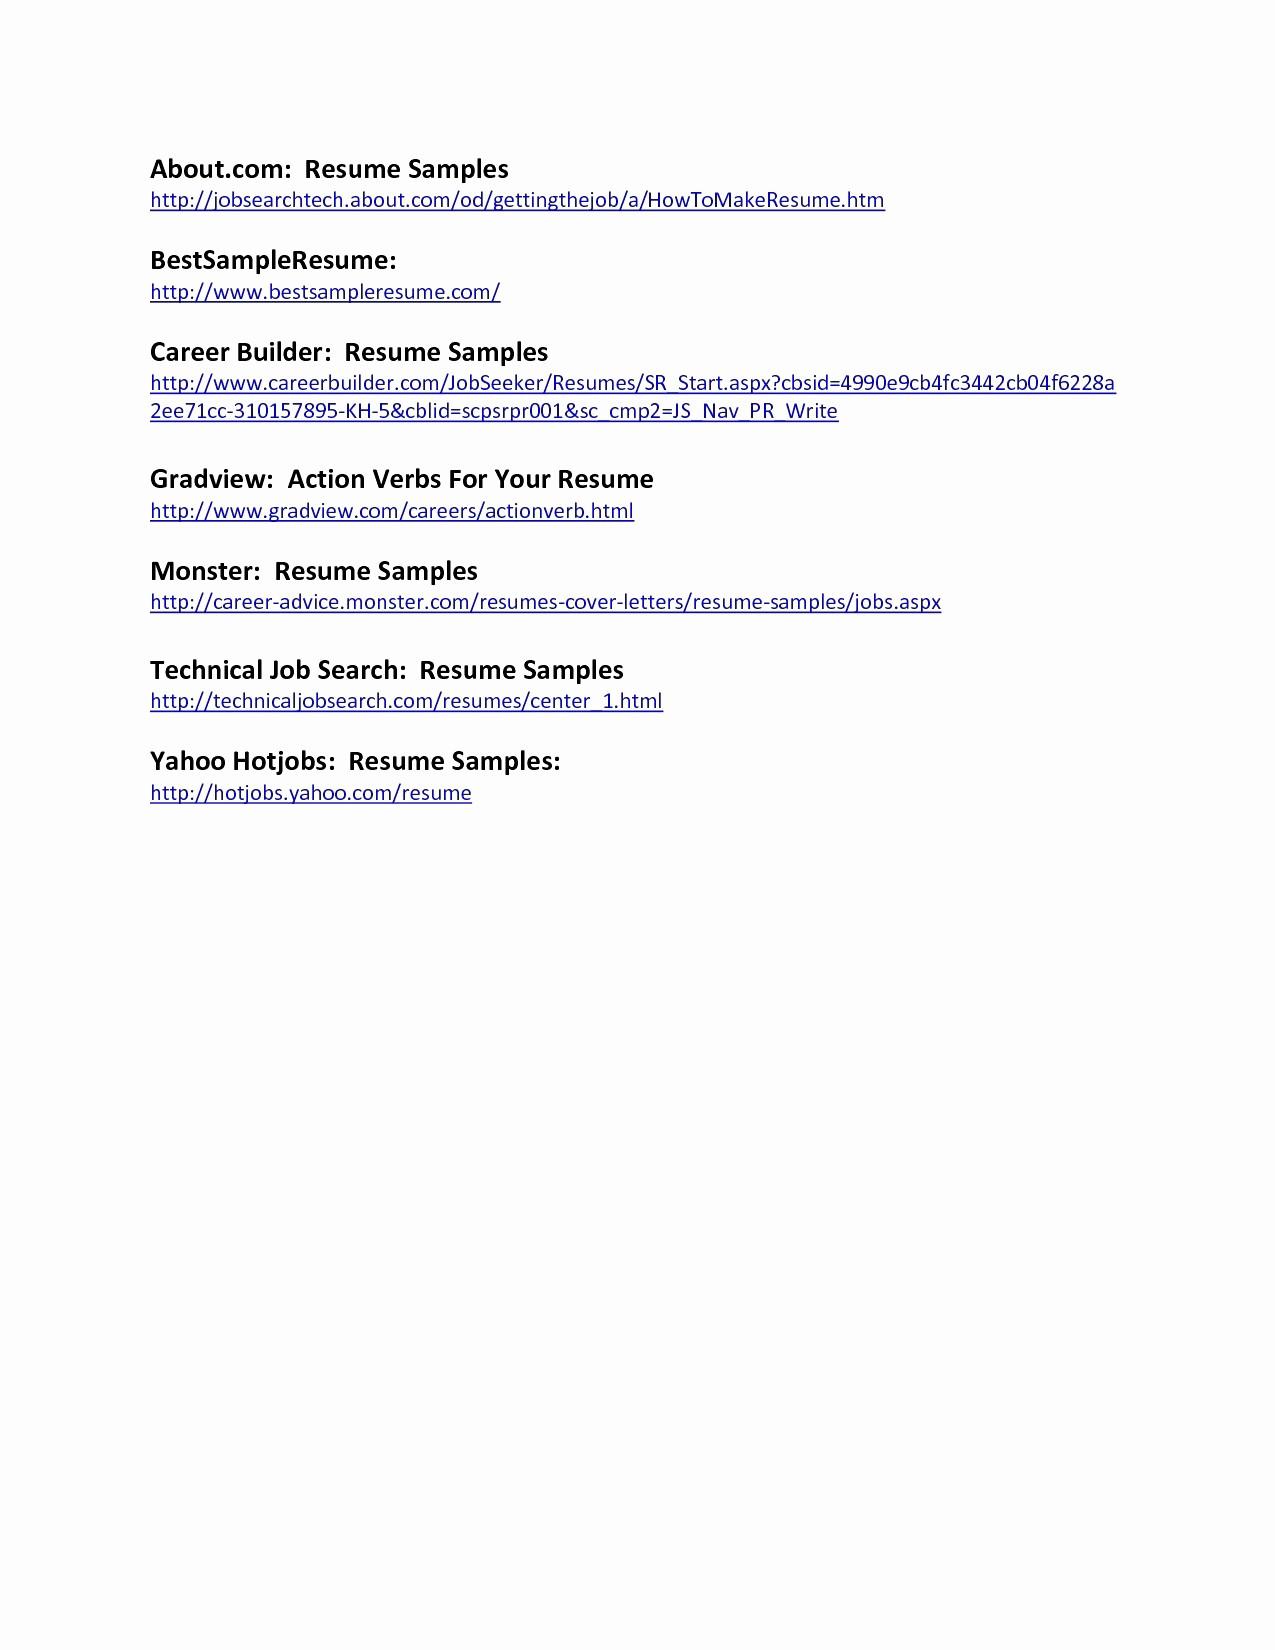 Curriculum Vitae Sample For Fresh Graduate Pdf Cool Examples